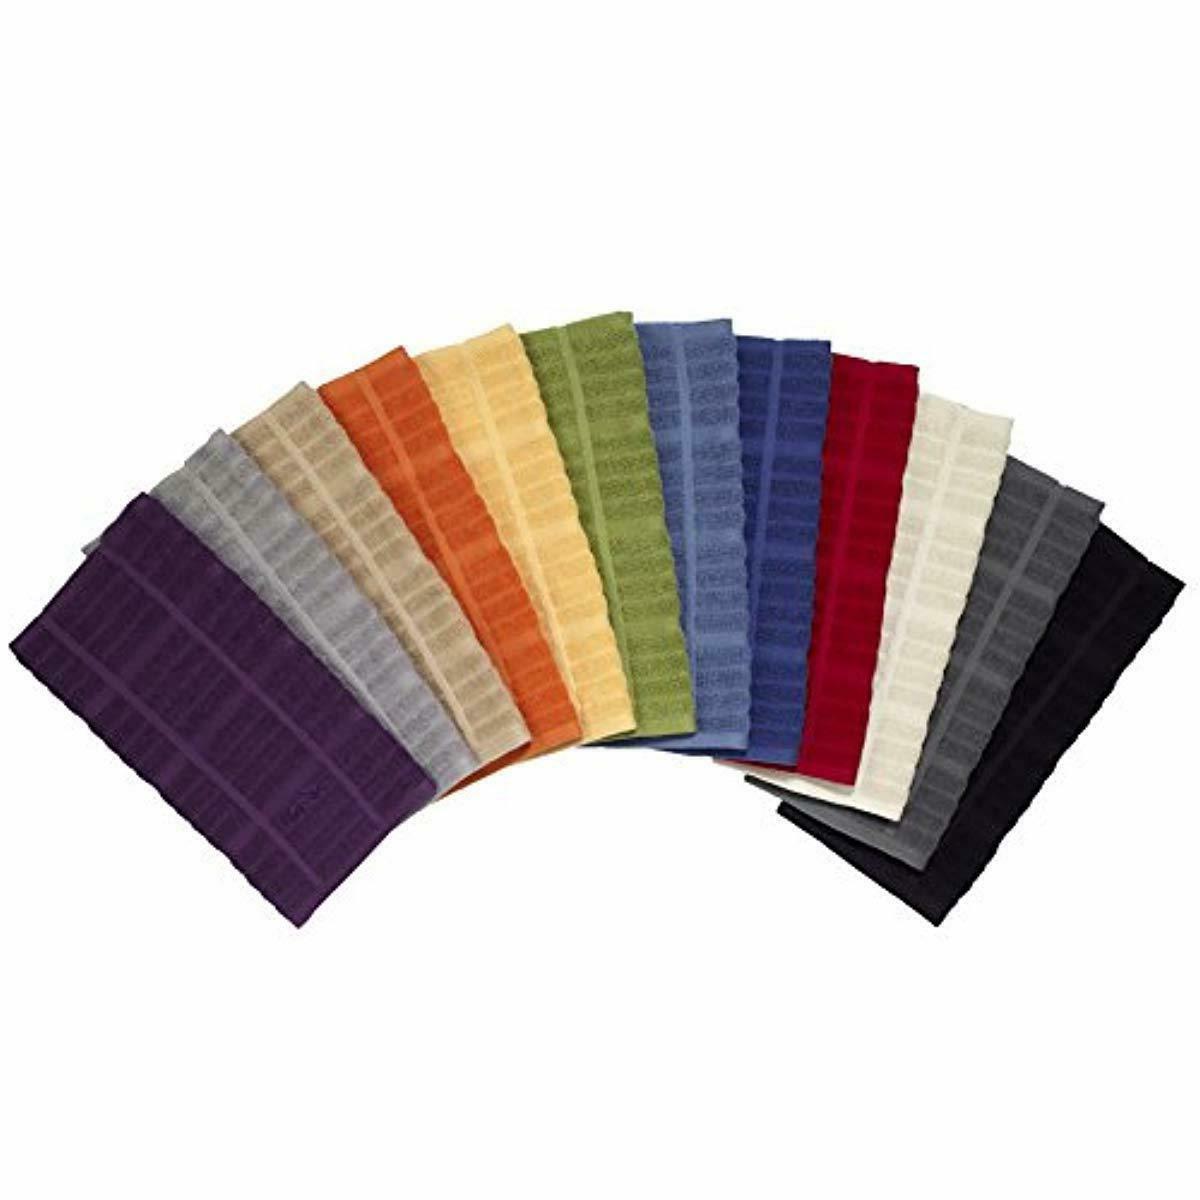 All-Clad Textiles Combed Terry Kitchen Towel, Oversiz NE